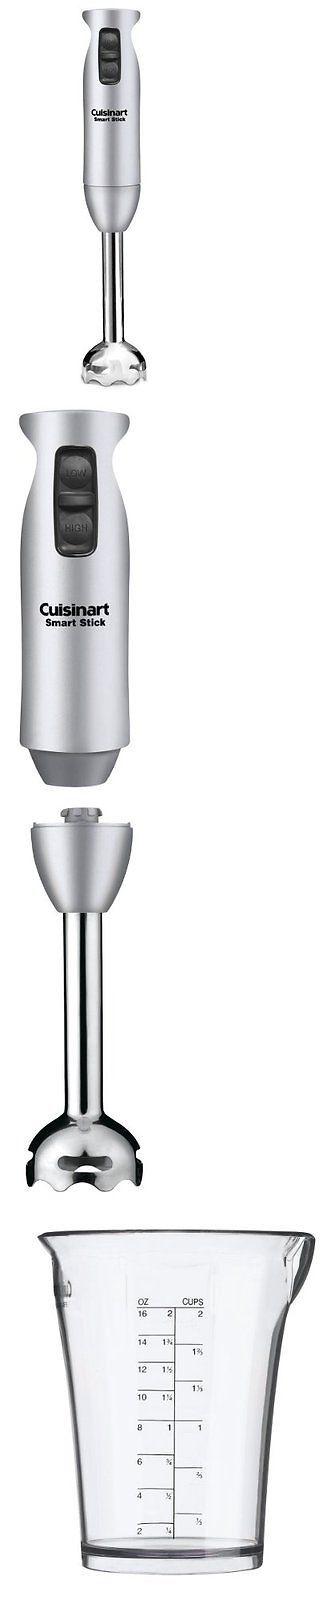 Blenders Handheld 133703: Cuisinart Smart Stick Hand Held Blender Mixer, Brushed Chrome Free Shipping, New -> BUY IT NOW ONLY: $34.79 on eBay!